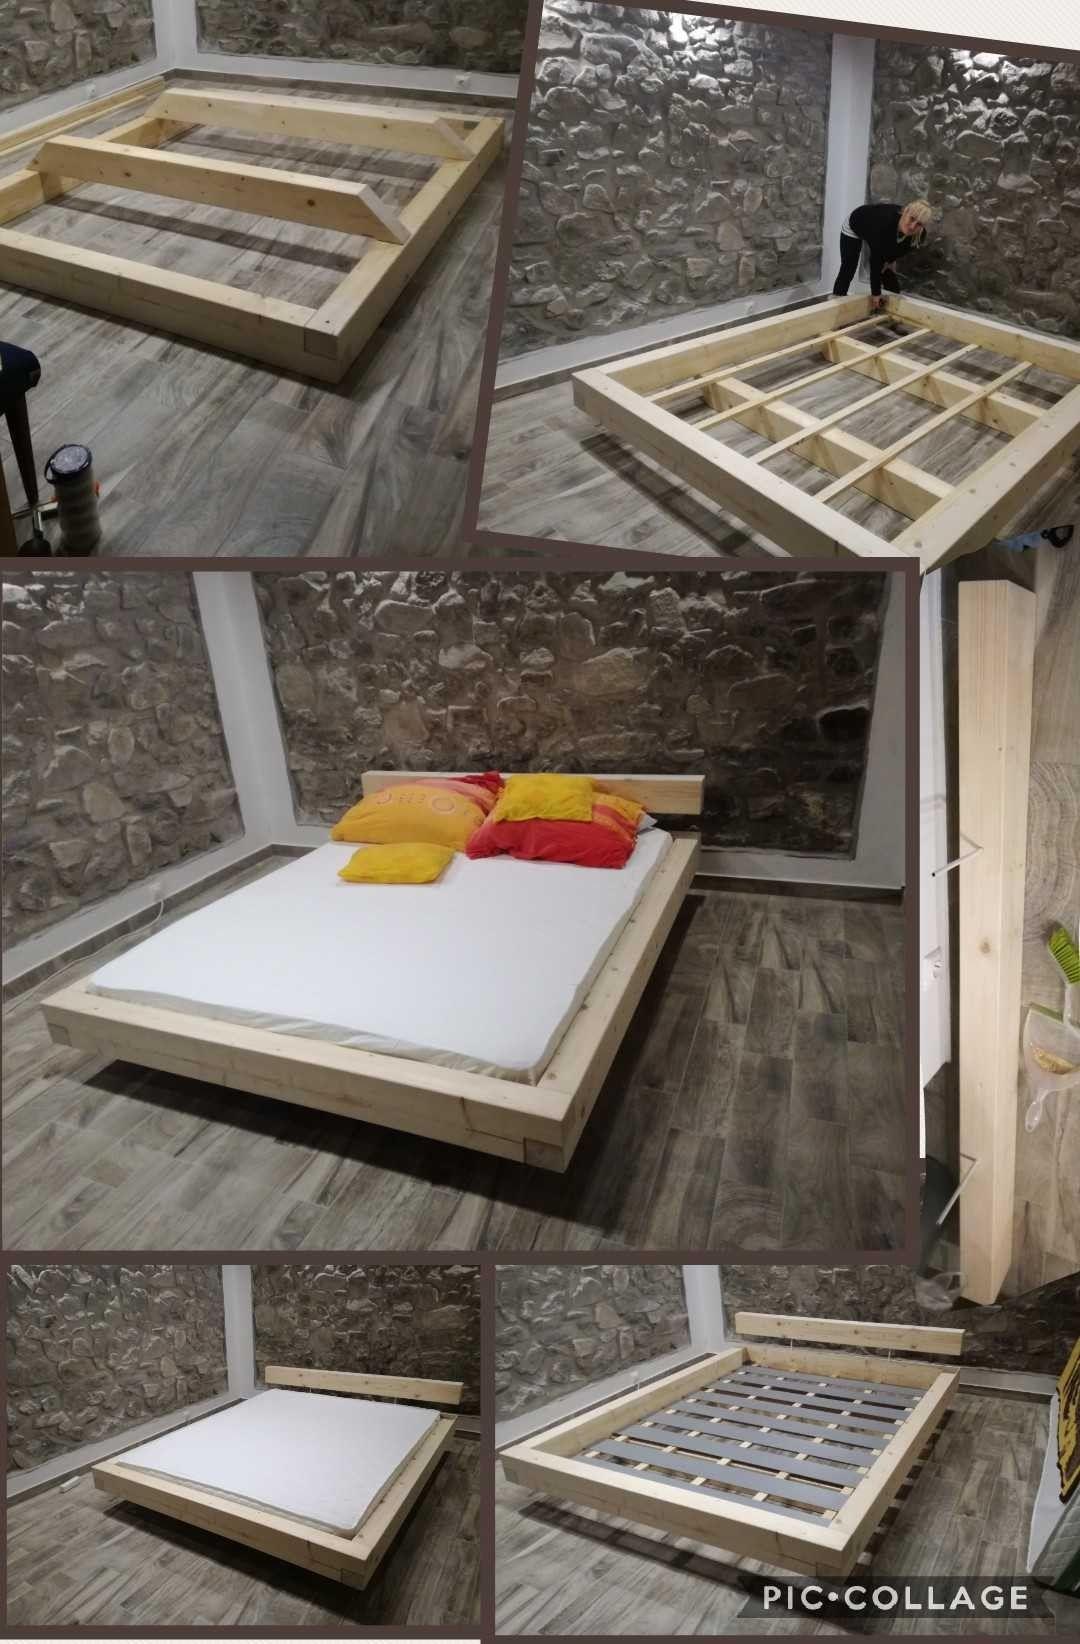 Floating Wood Bed 160x200 10x16cm Pine Wood Bed Frame Design Floating Bed Frame Wood Bed Frame